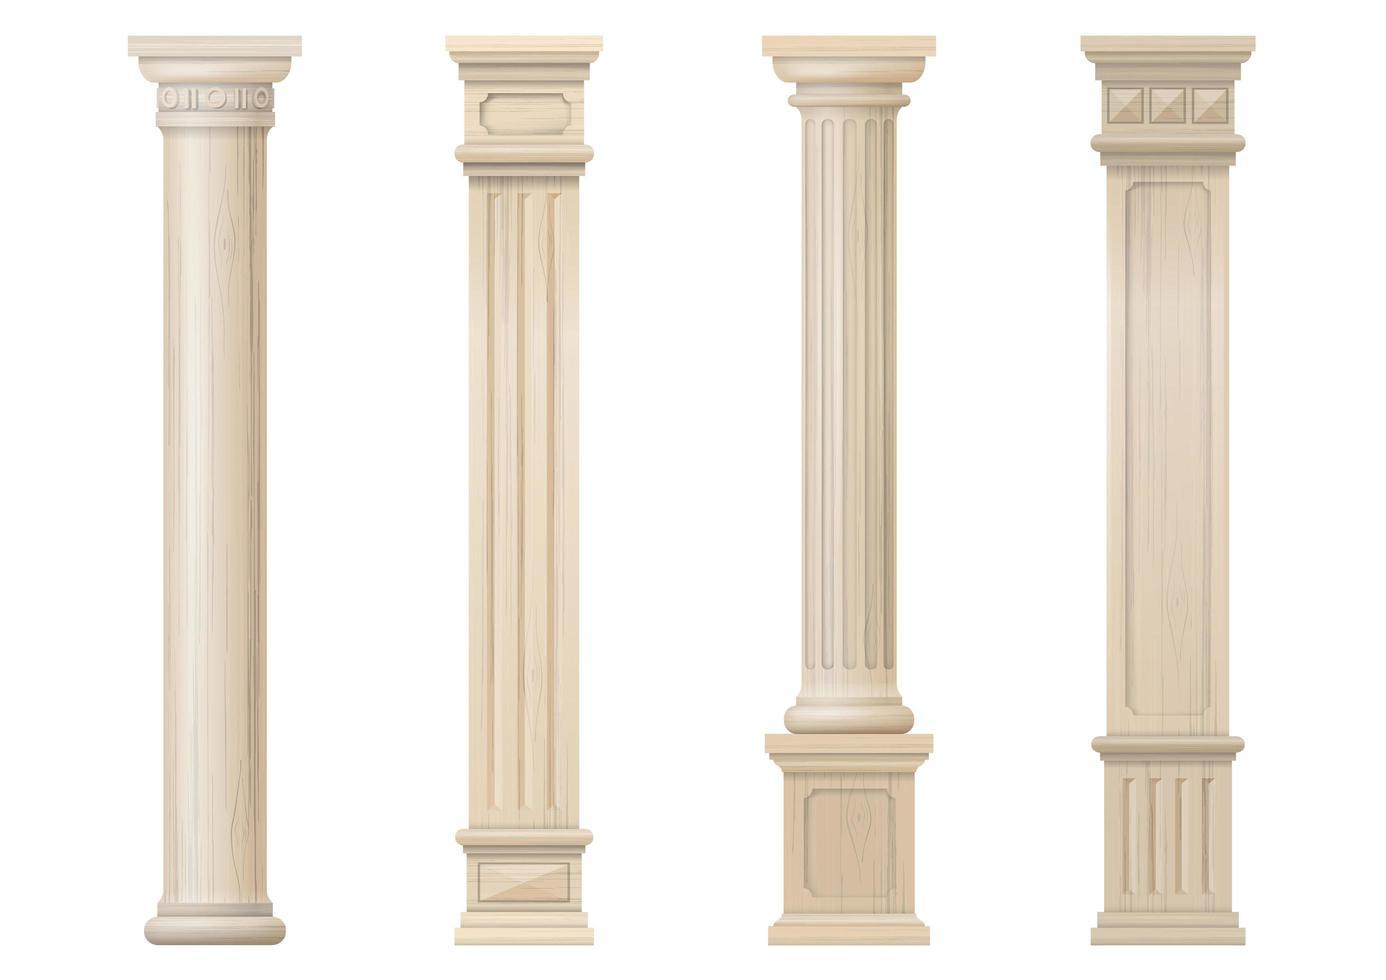 establecer columnas talladas de madera de color claro vintage vector